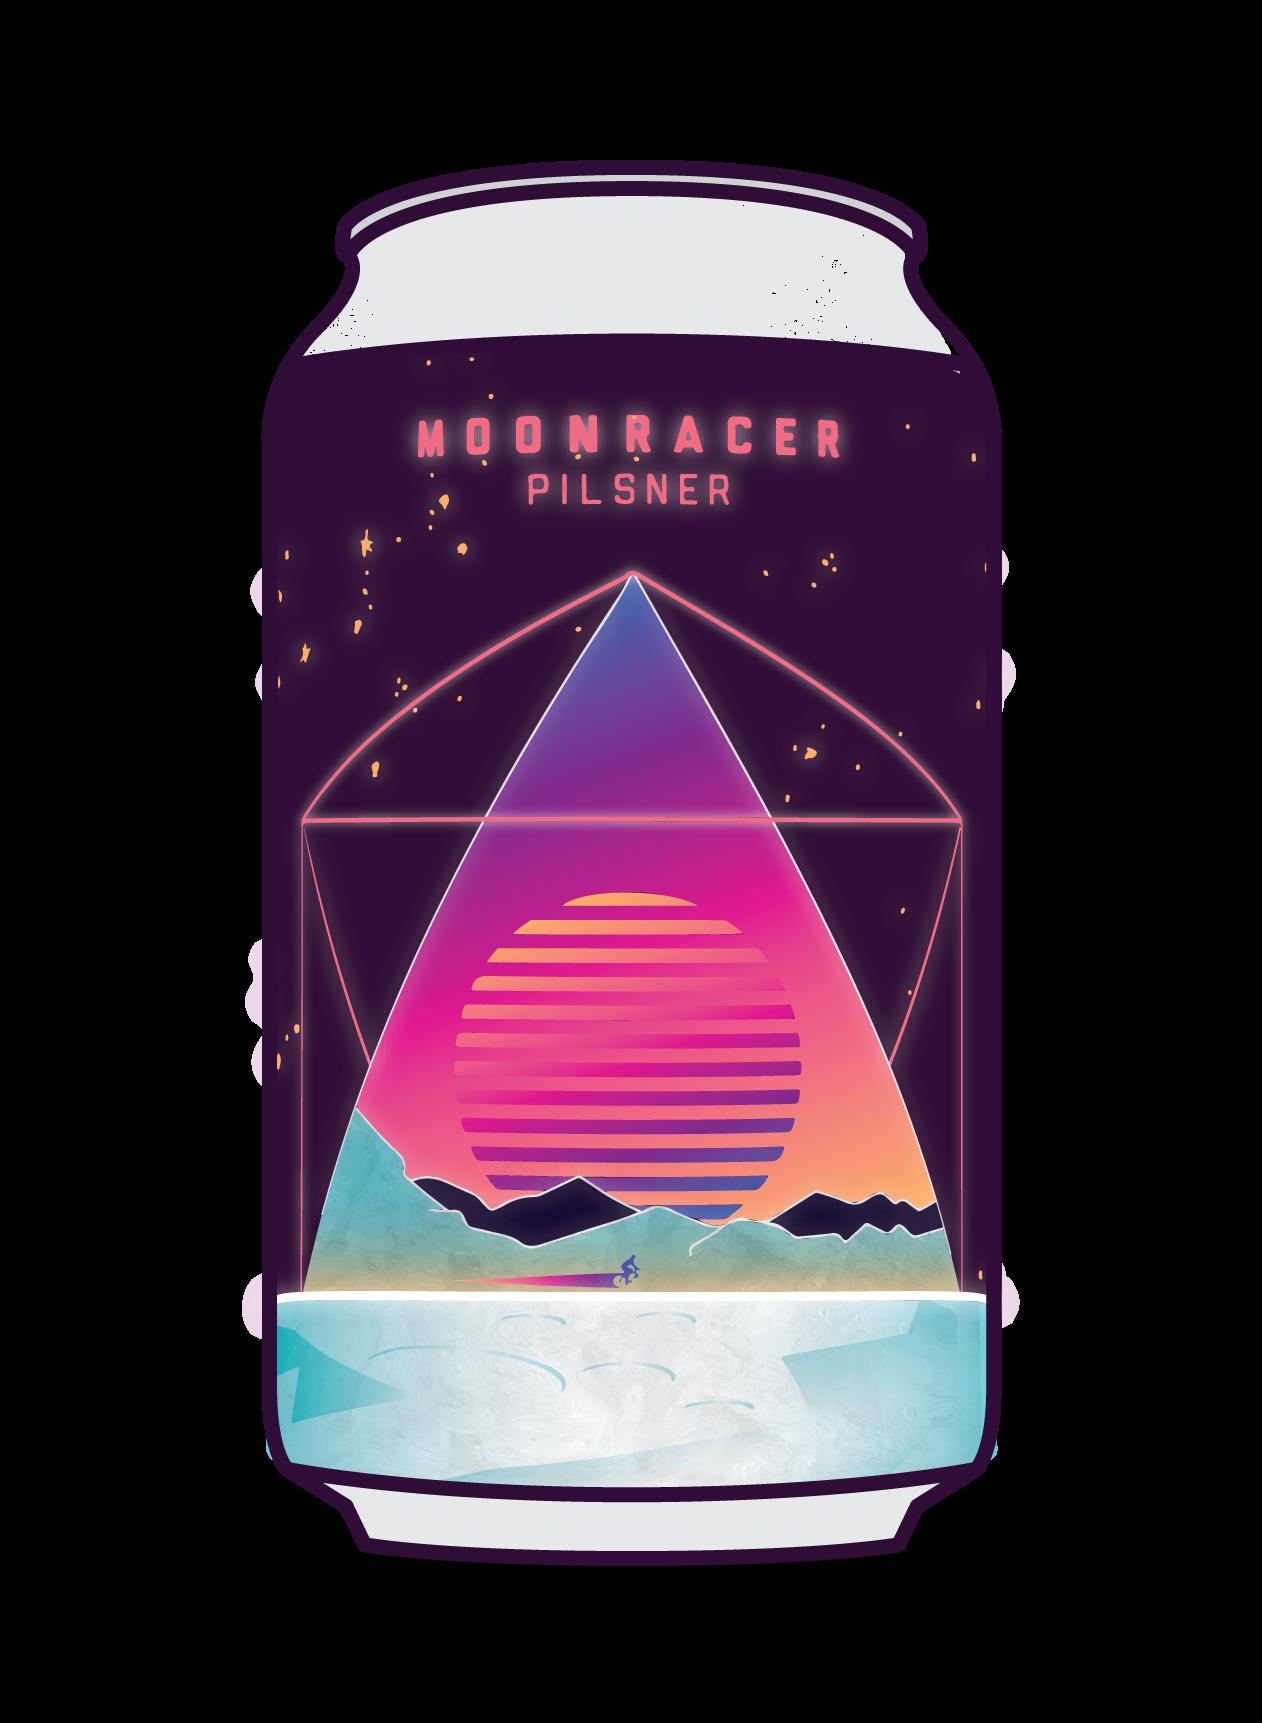 Moonracer Image